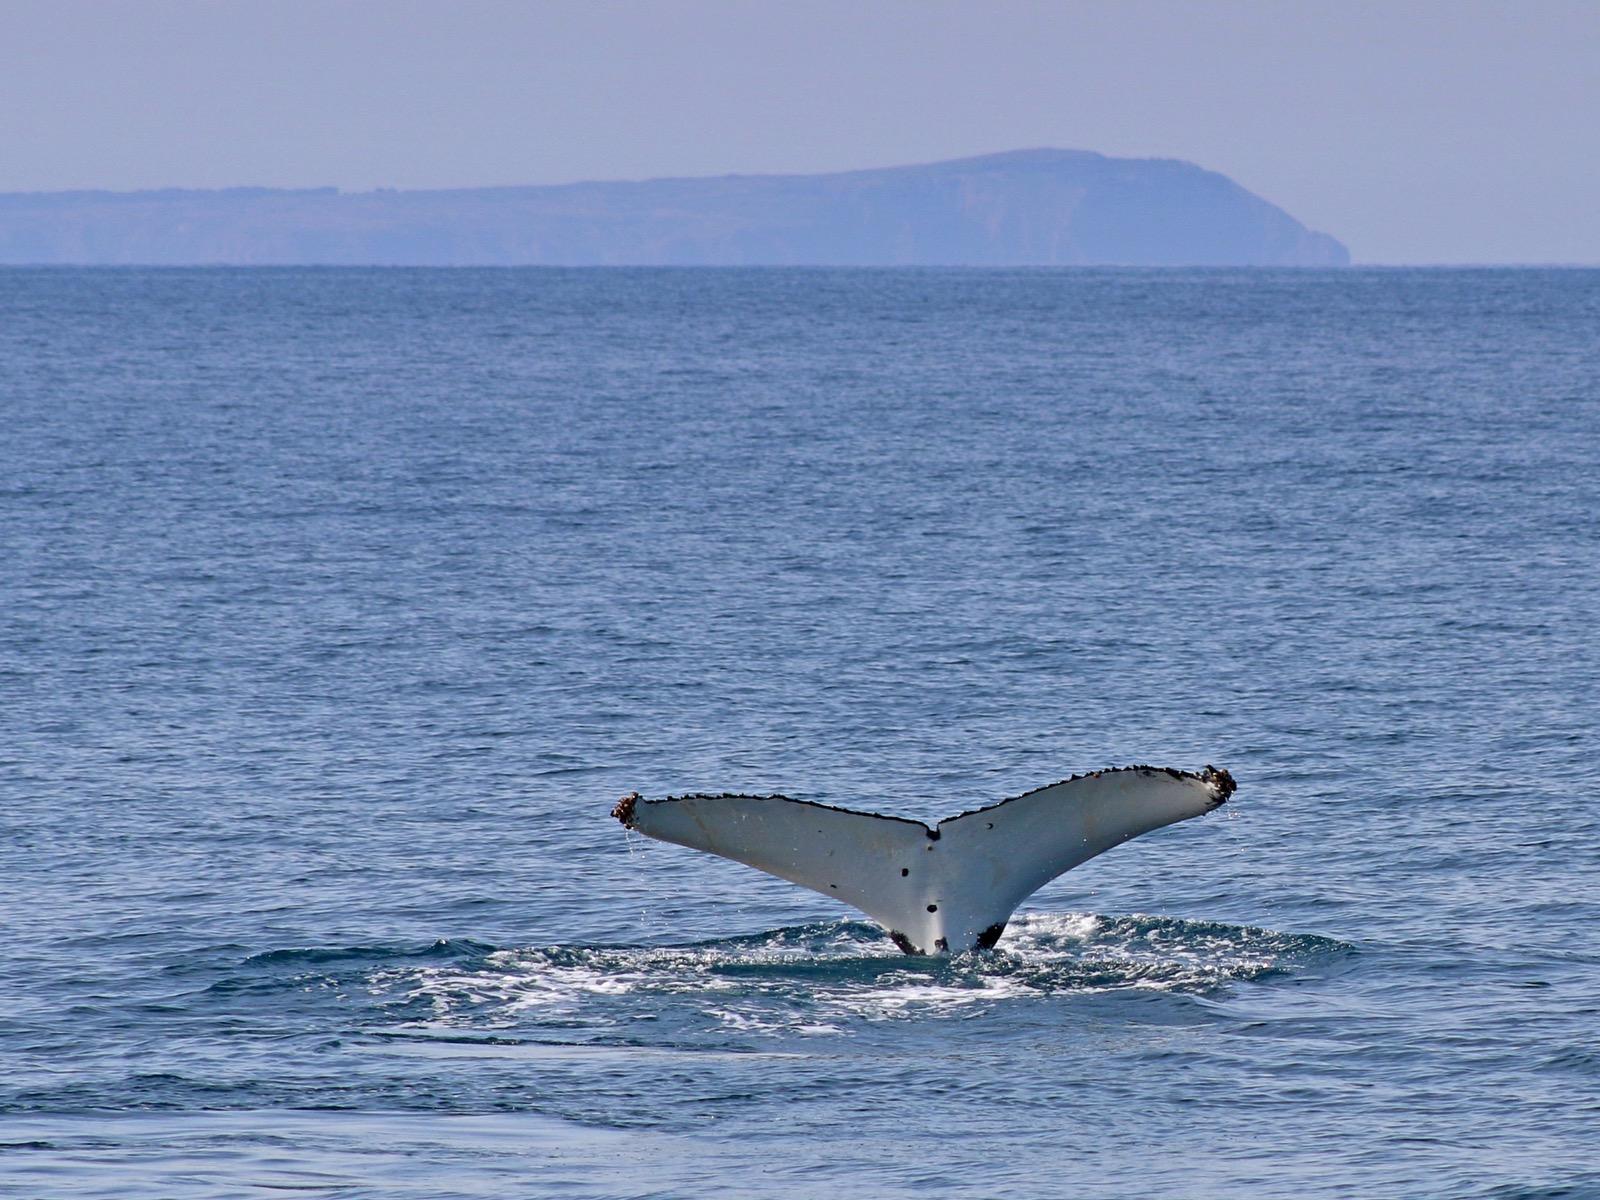 Humpback whale off Phillip Island